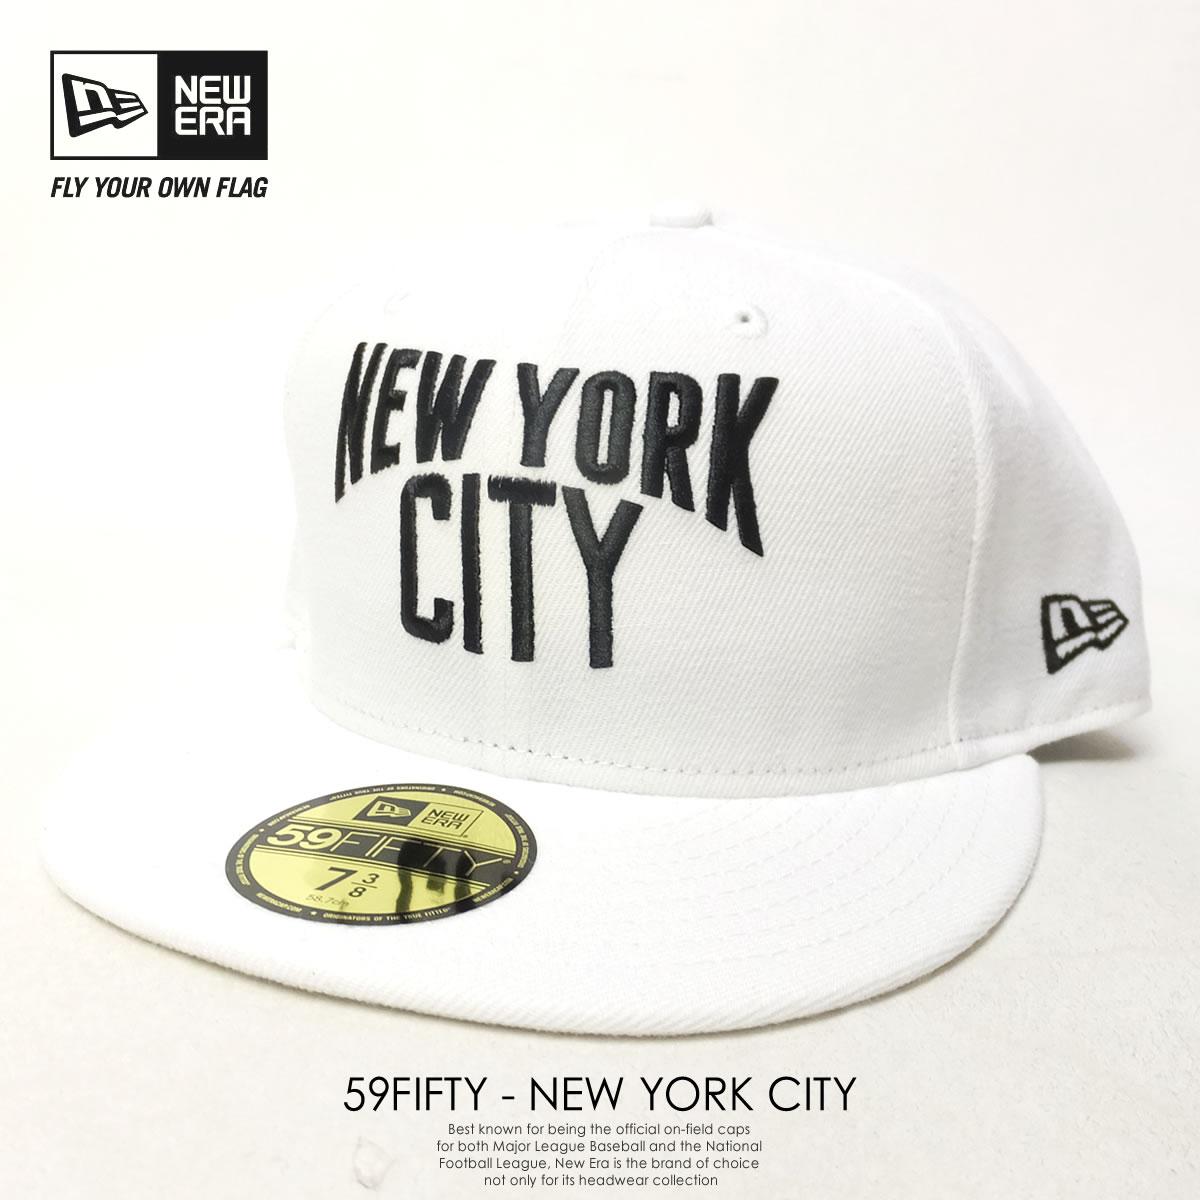 cfc4c69700f NEW ERA ニューエラ ベースボールキャップ 59FIFTY NEW YORK CITY ホワイト×ブラック 70349958 7V2099